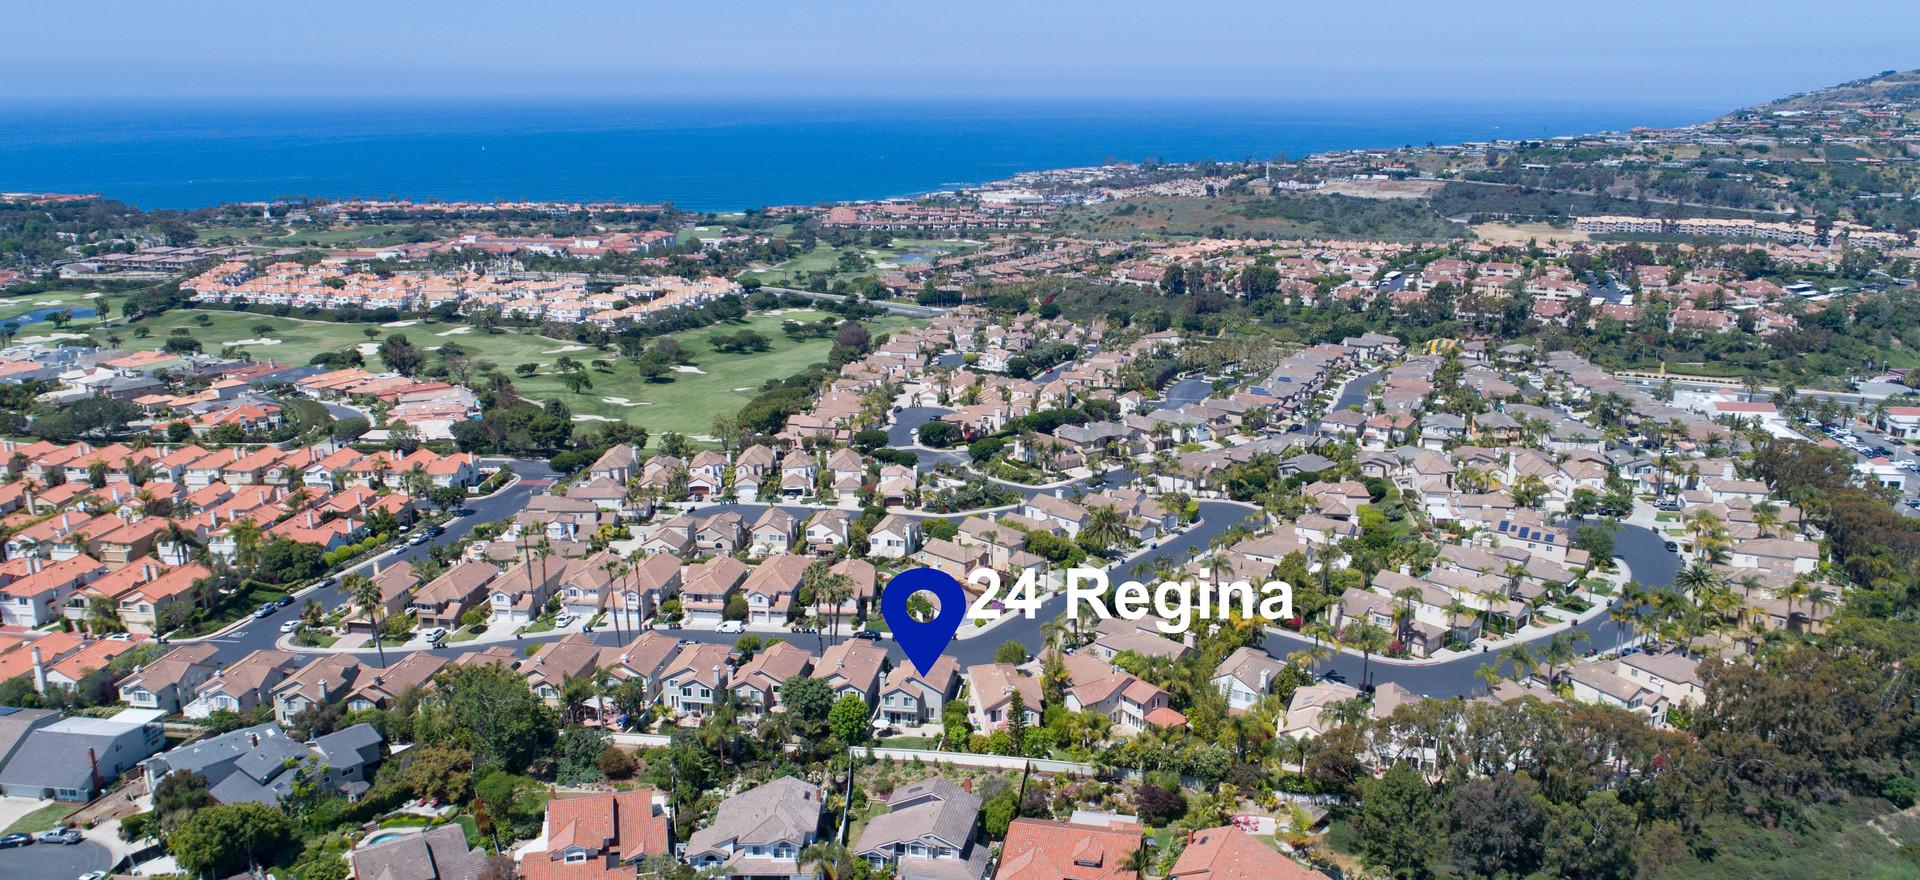 24 Regina Aerial-6 with overlay.jpg